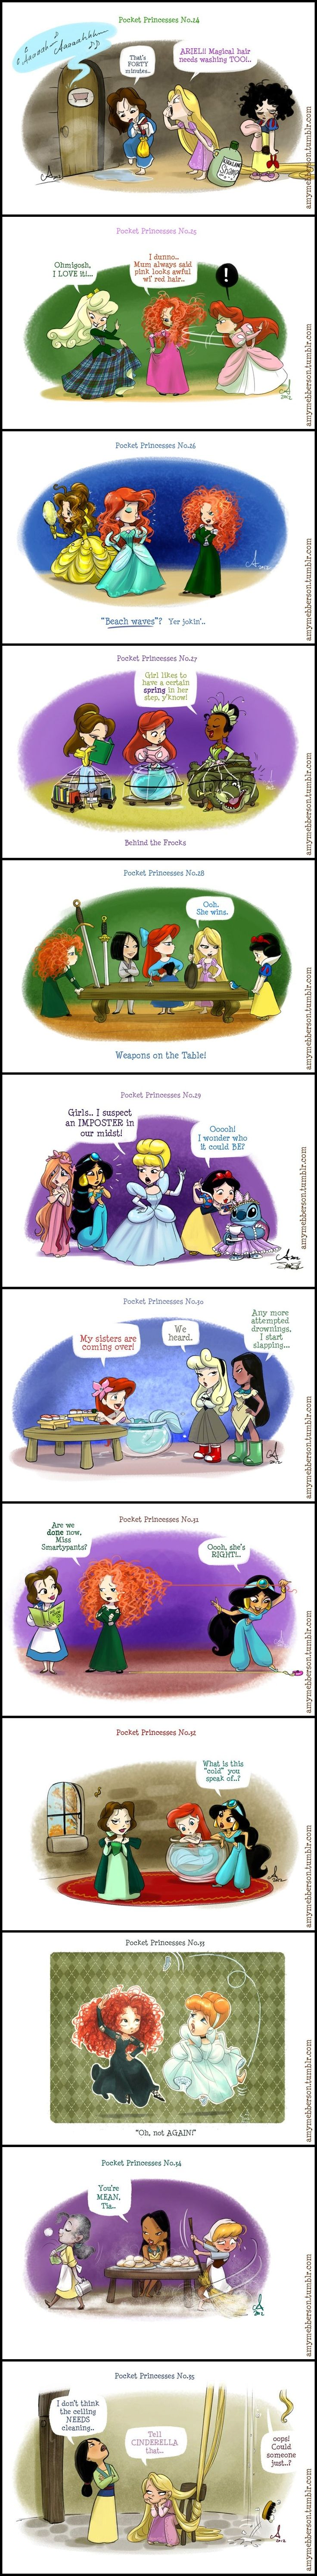 Pocket de princesas